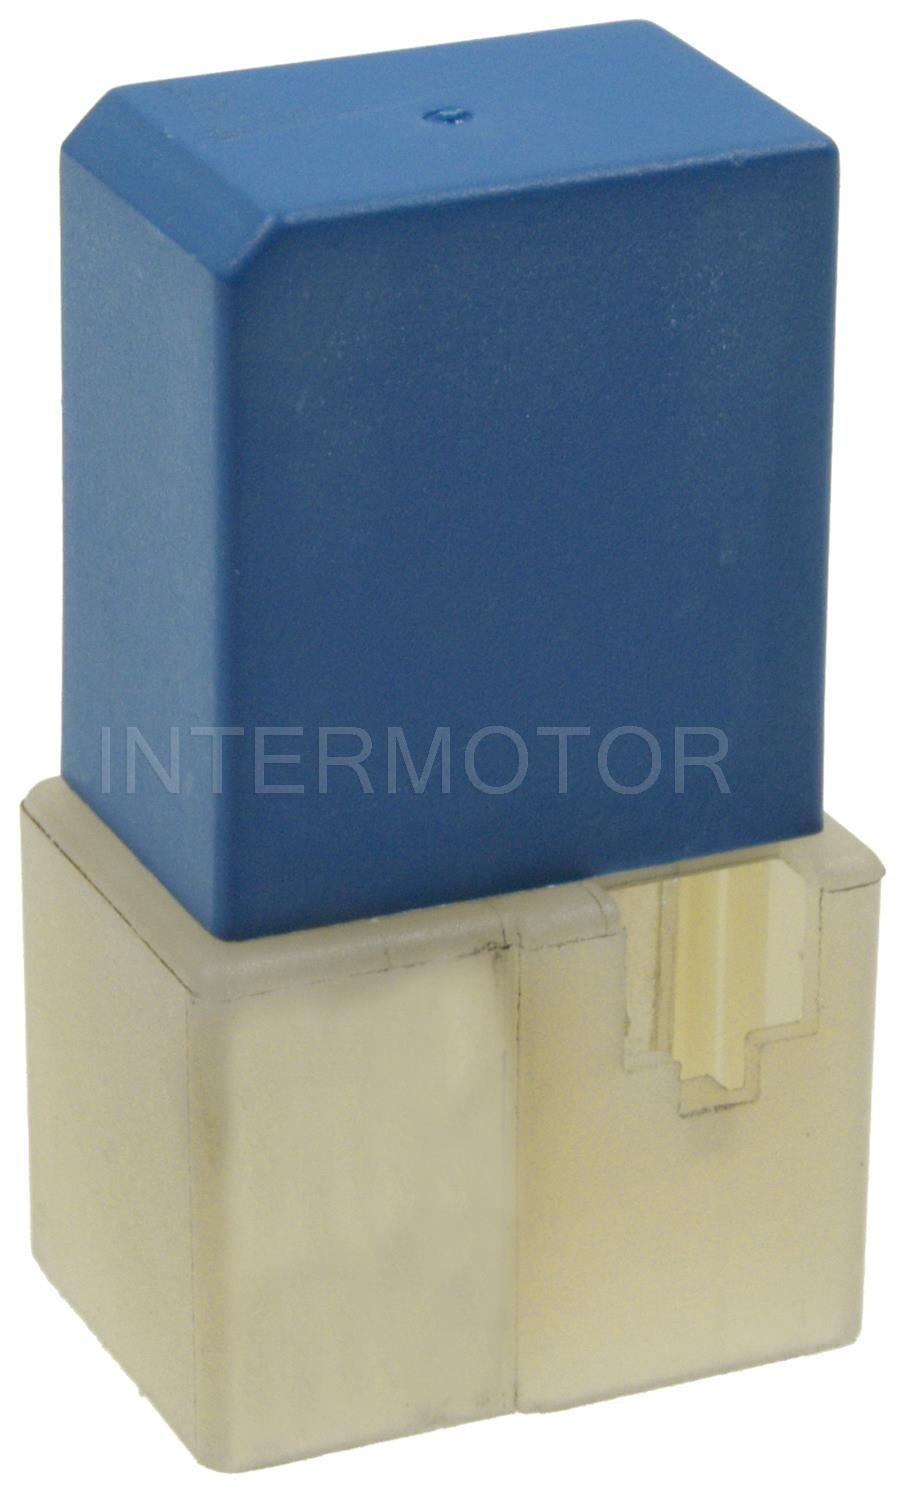 STANDARD INTERMOTOR WIRE - Power Window Relay - STI RY-418